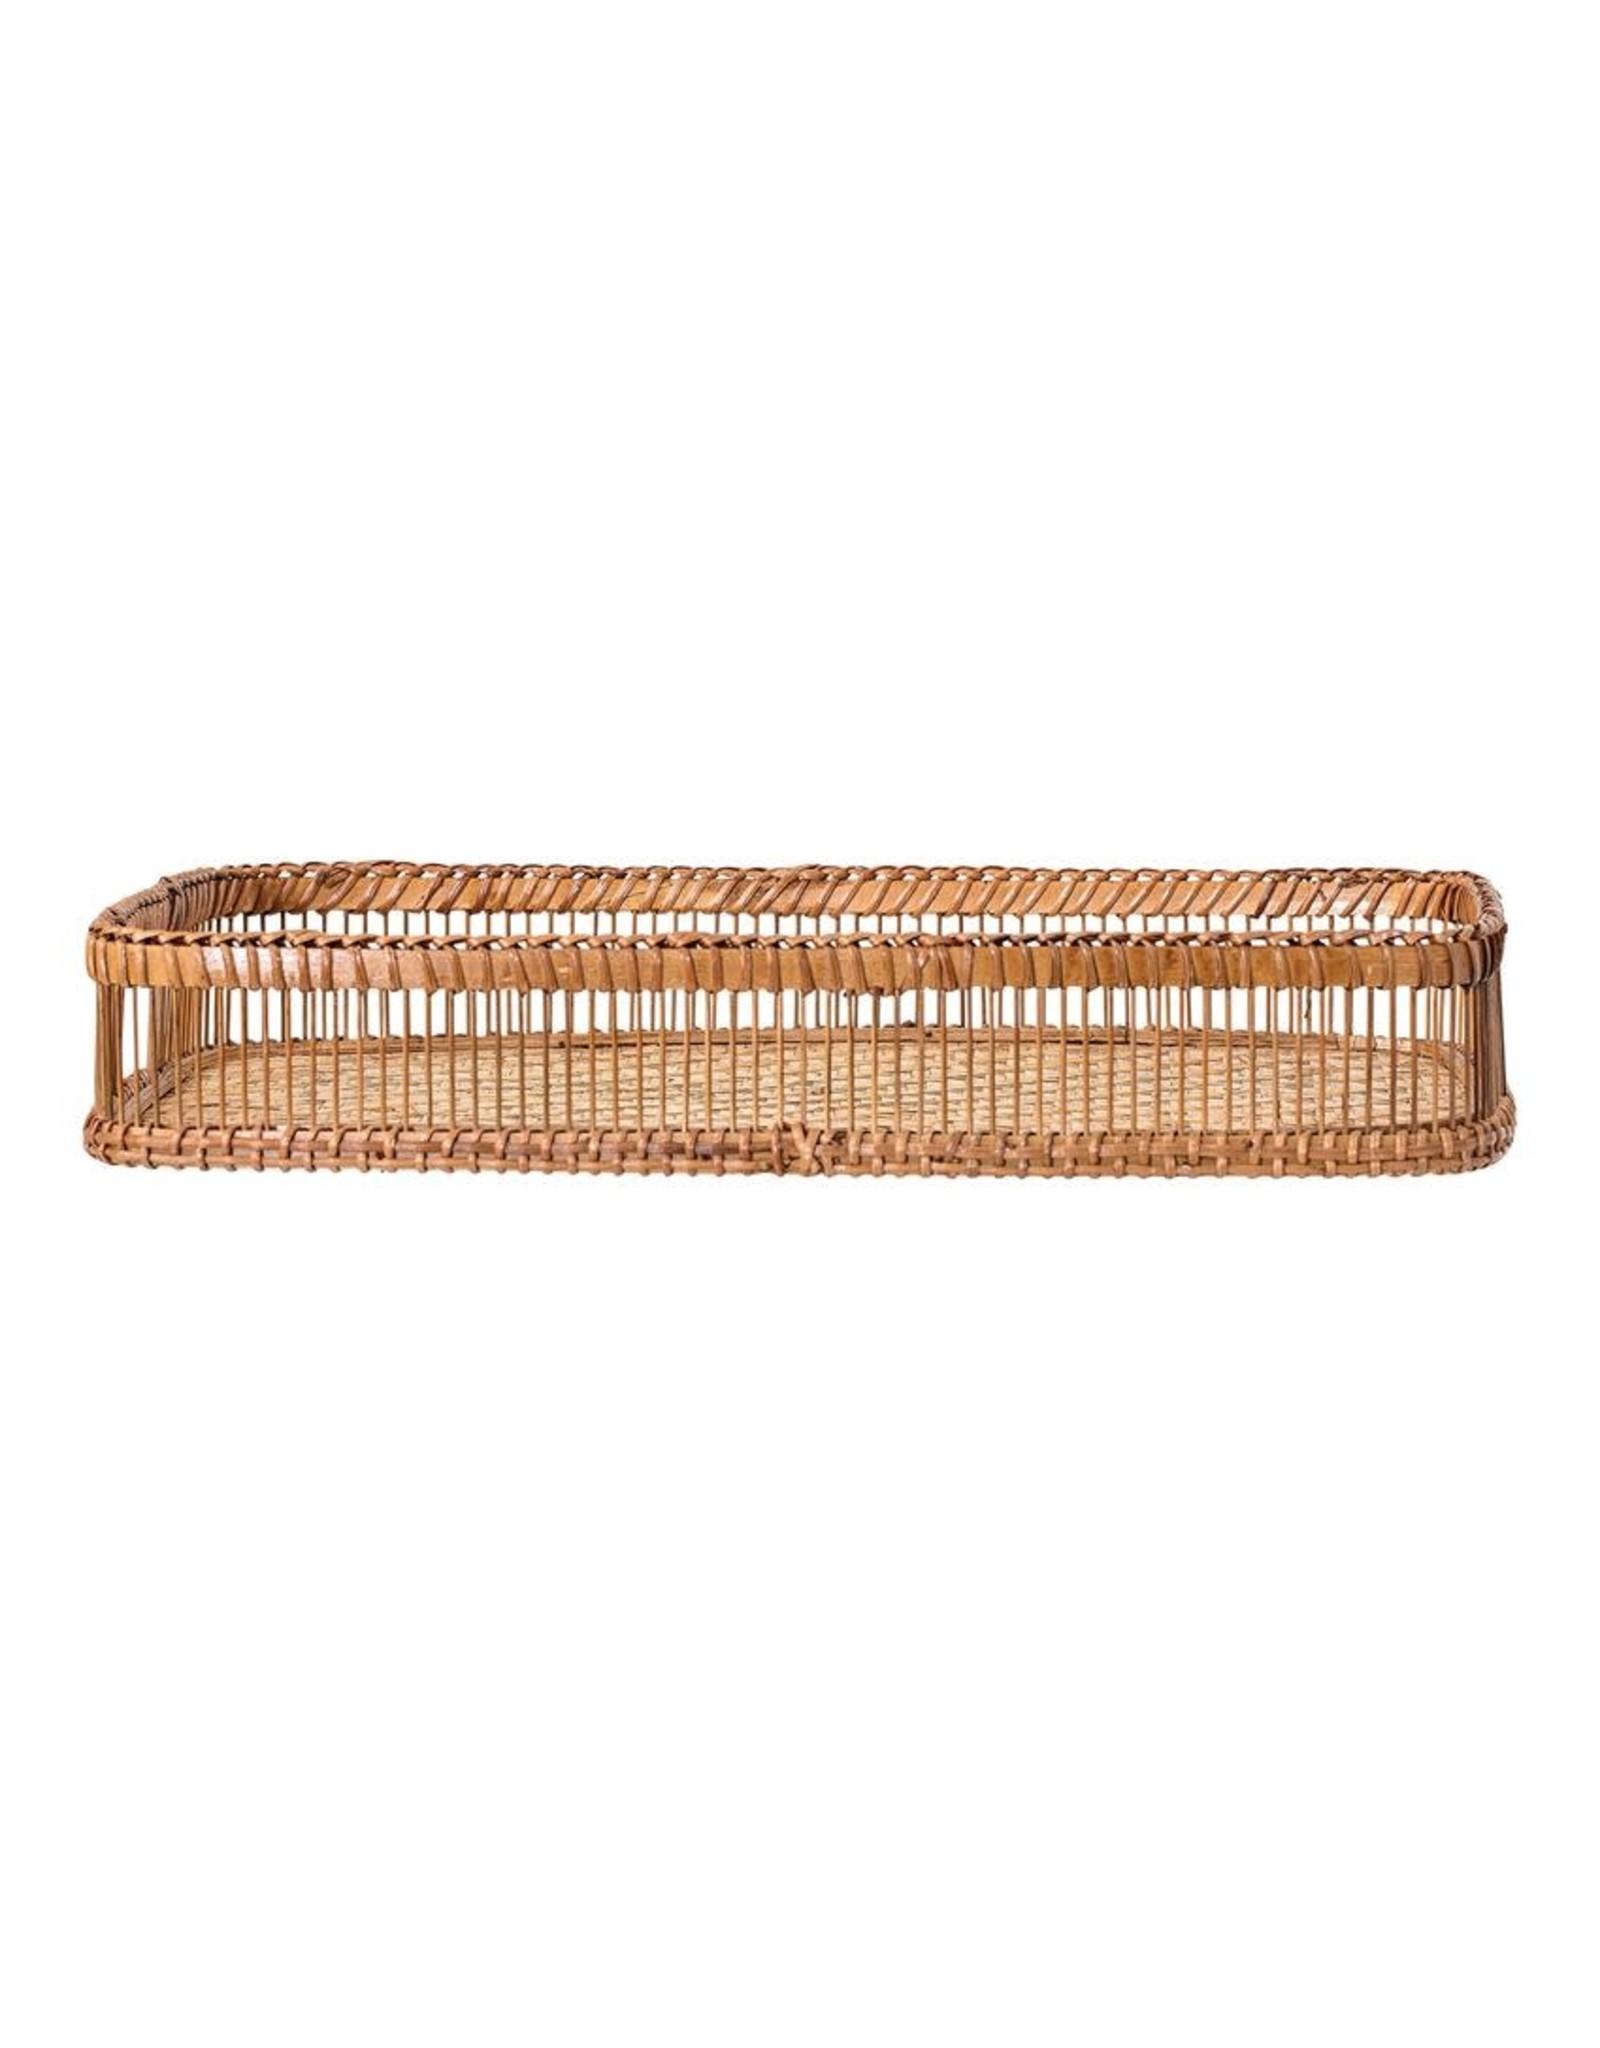 Website Decorative Bamboo Tray w/ Handles, Natural